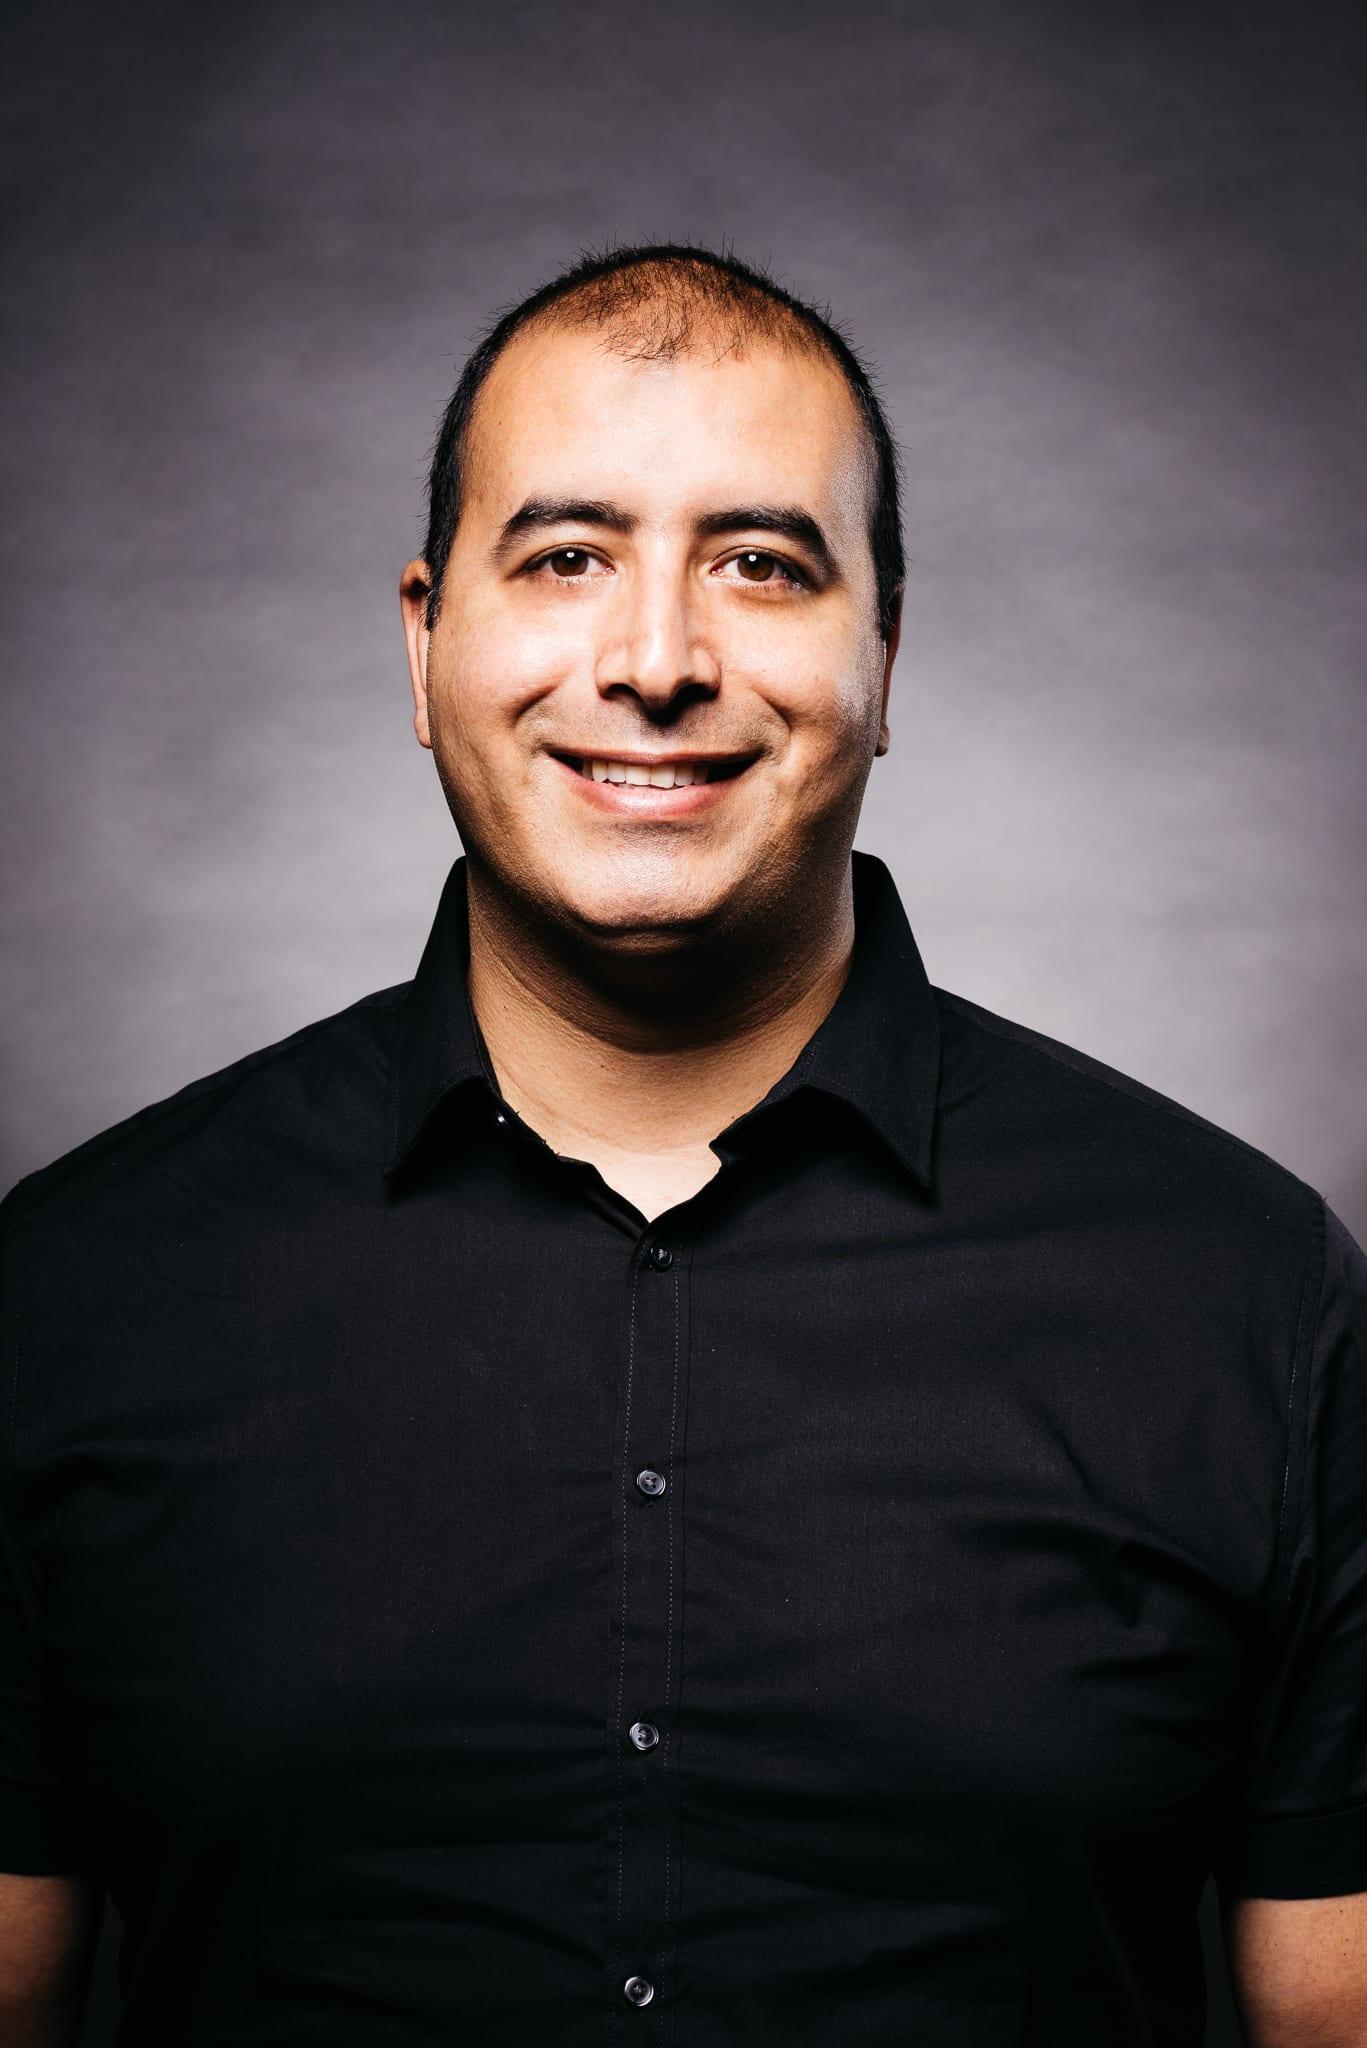 Oren Mizrachi, Leverate's Director of Crypto